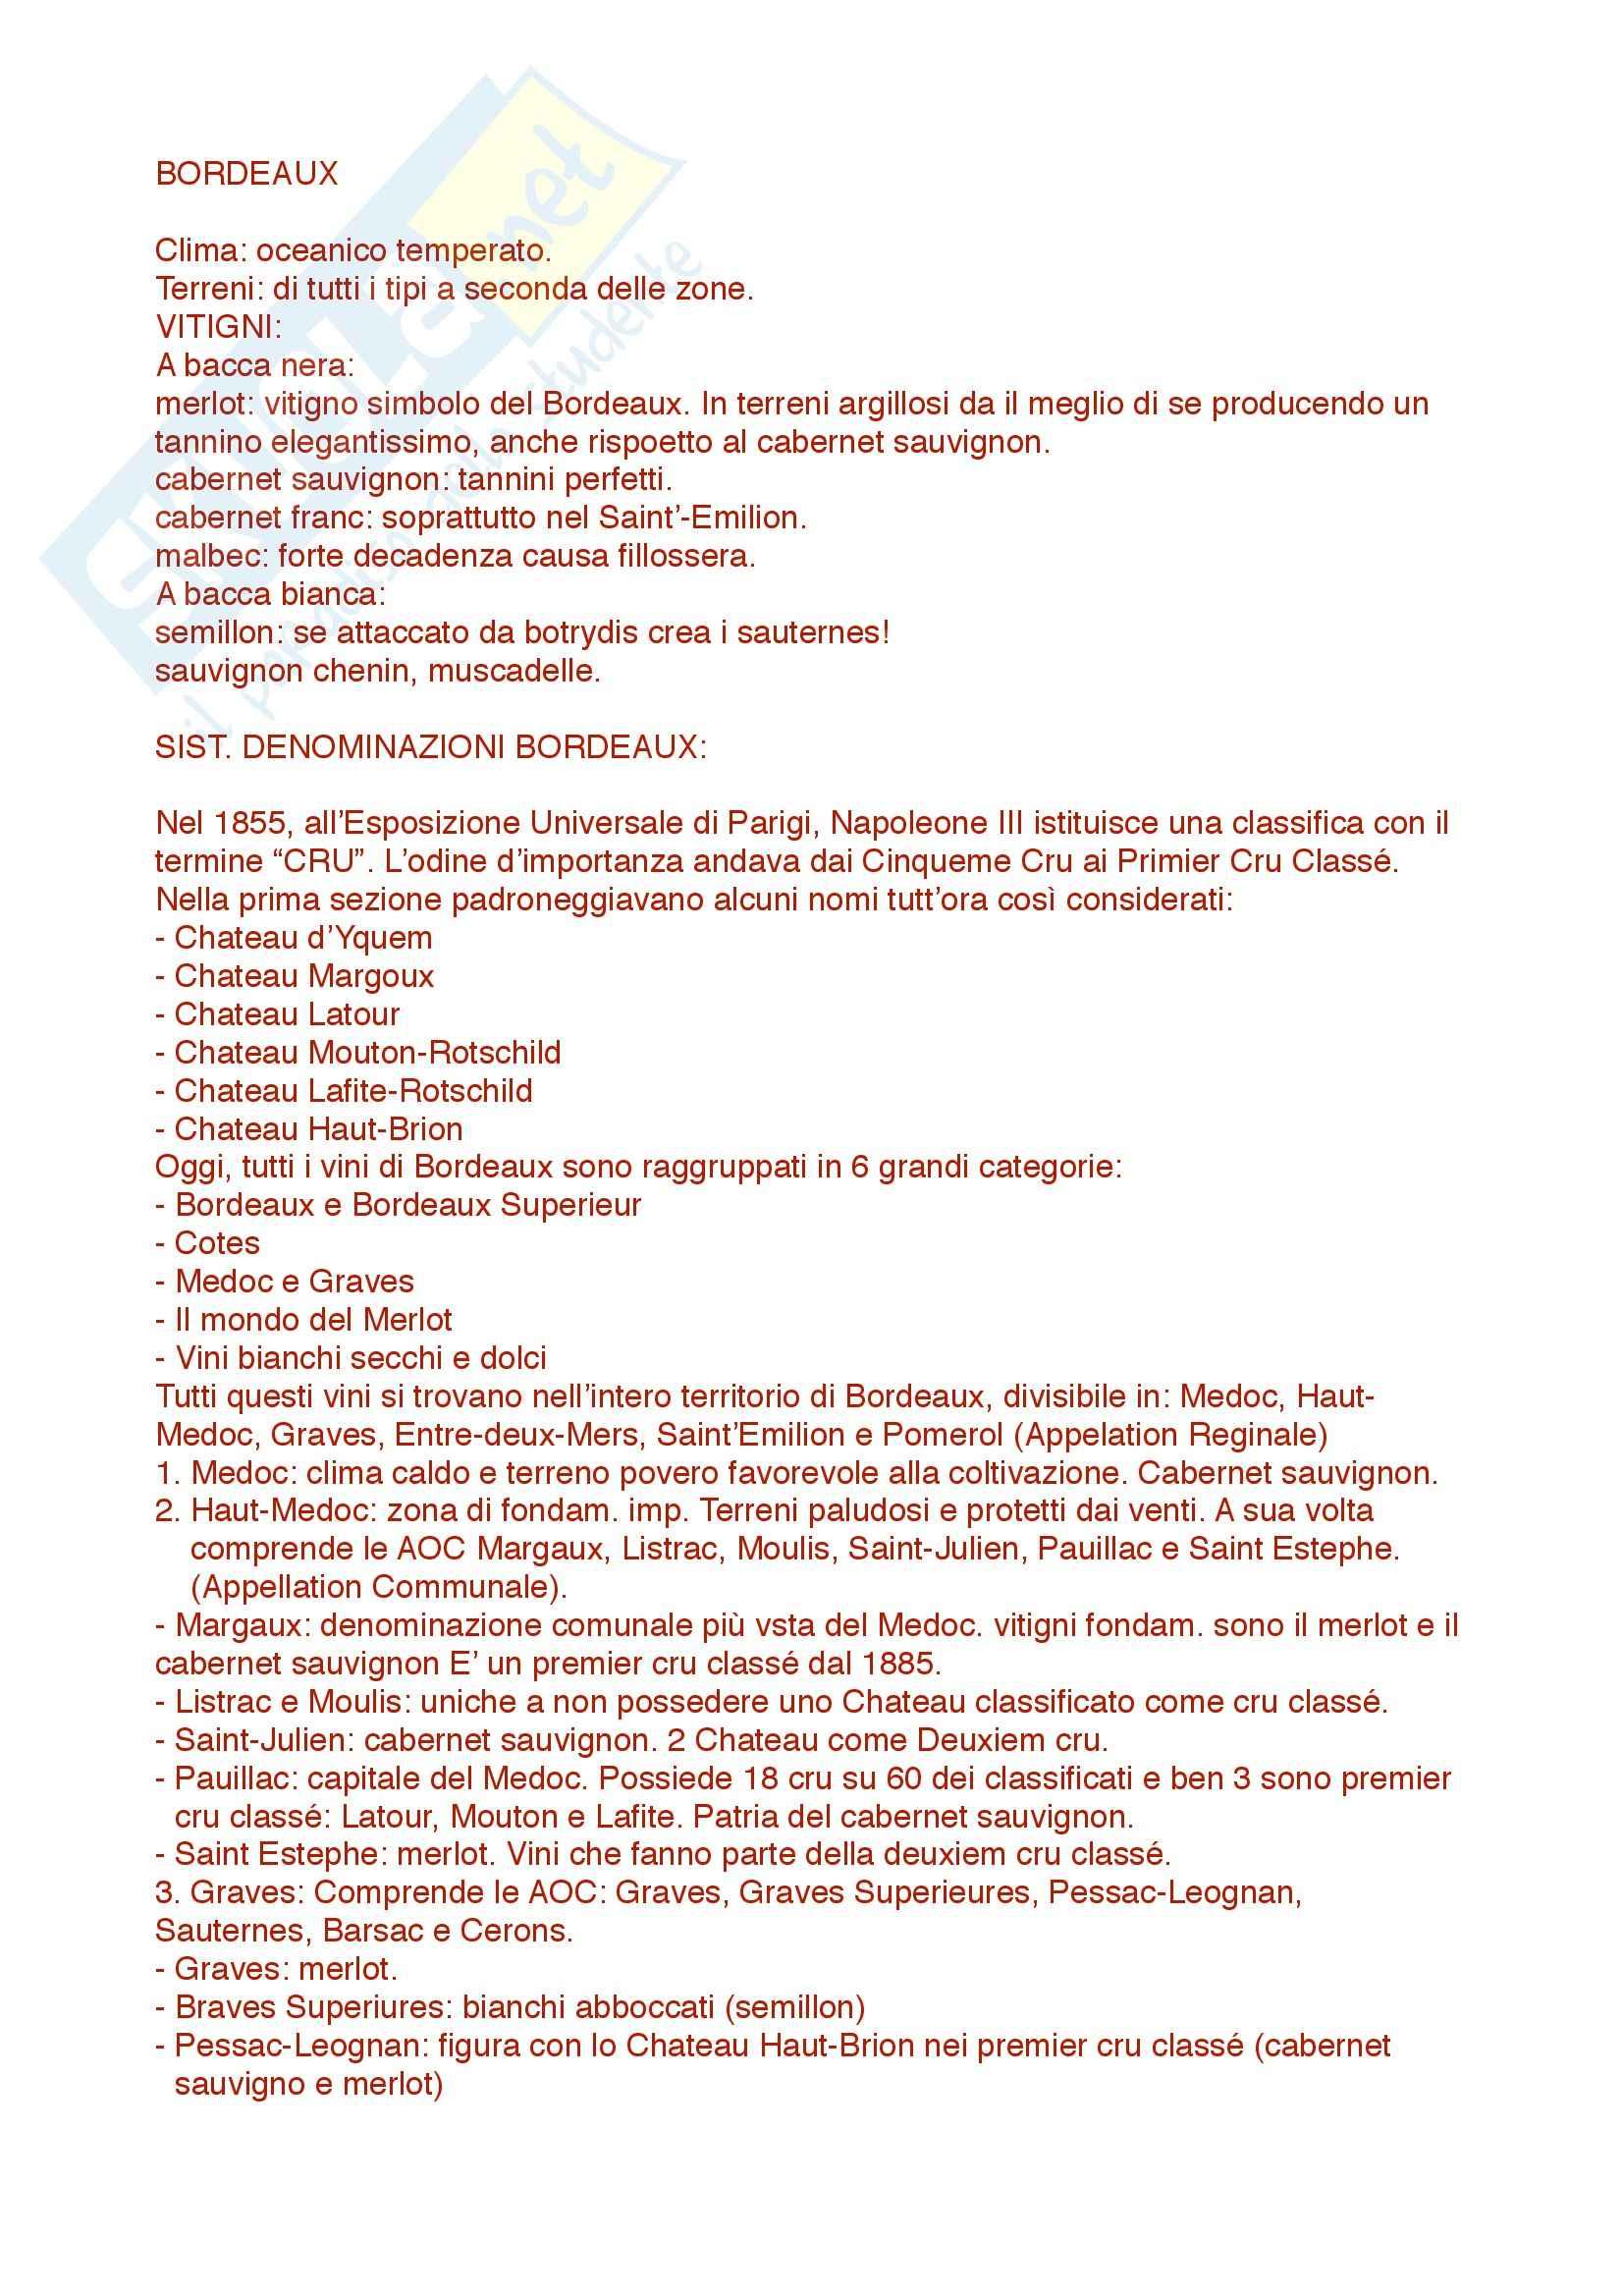 Bordeaux: Appunti di Enologia